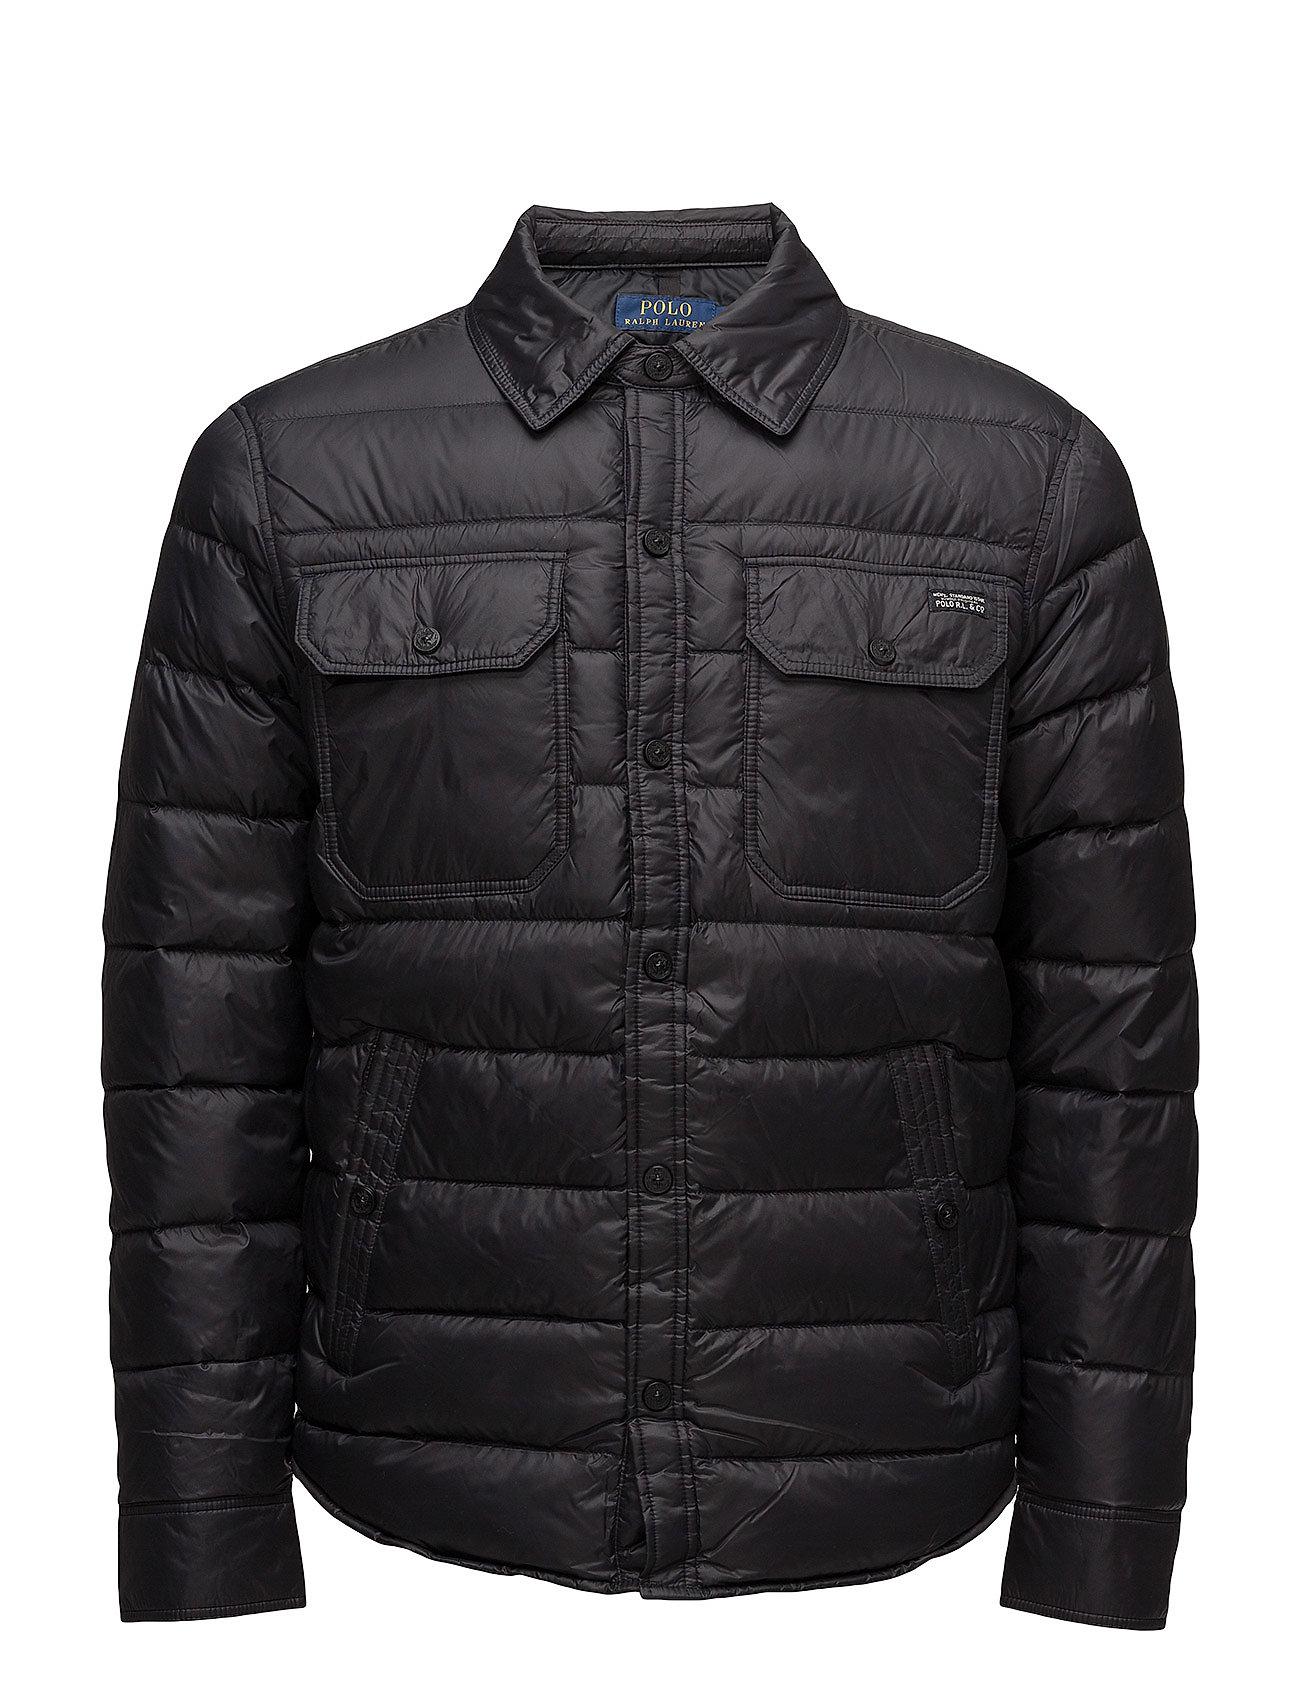 Polo Ralph Lauren Taffeta Down Shirt Jacket